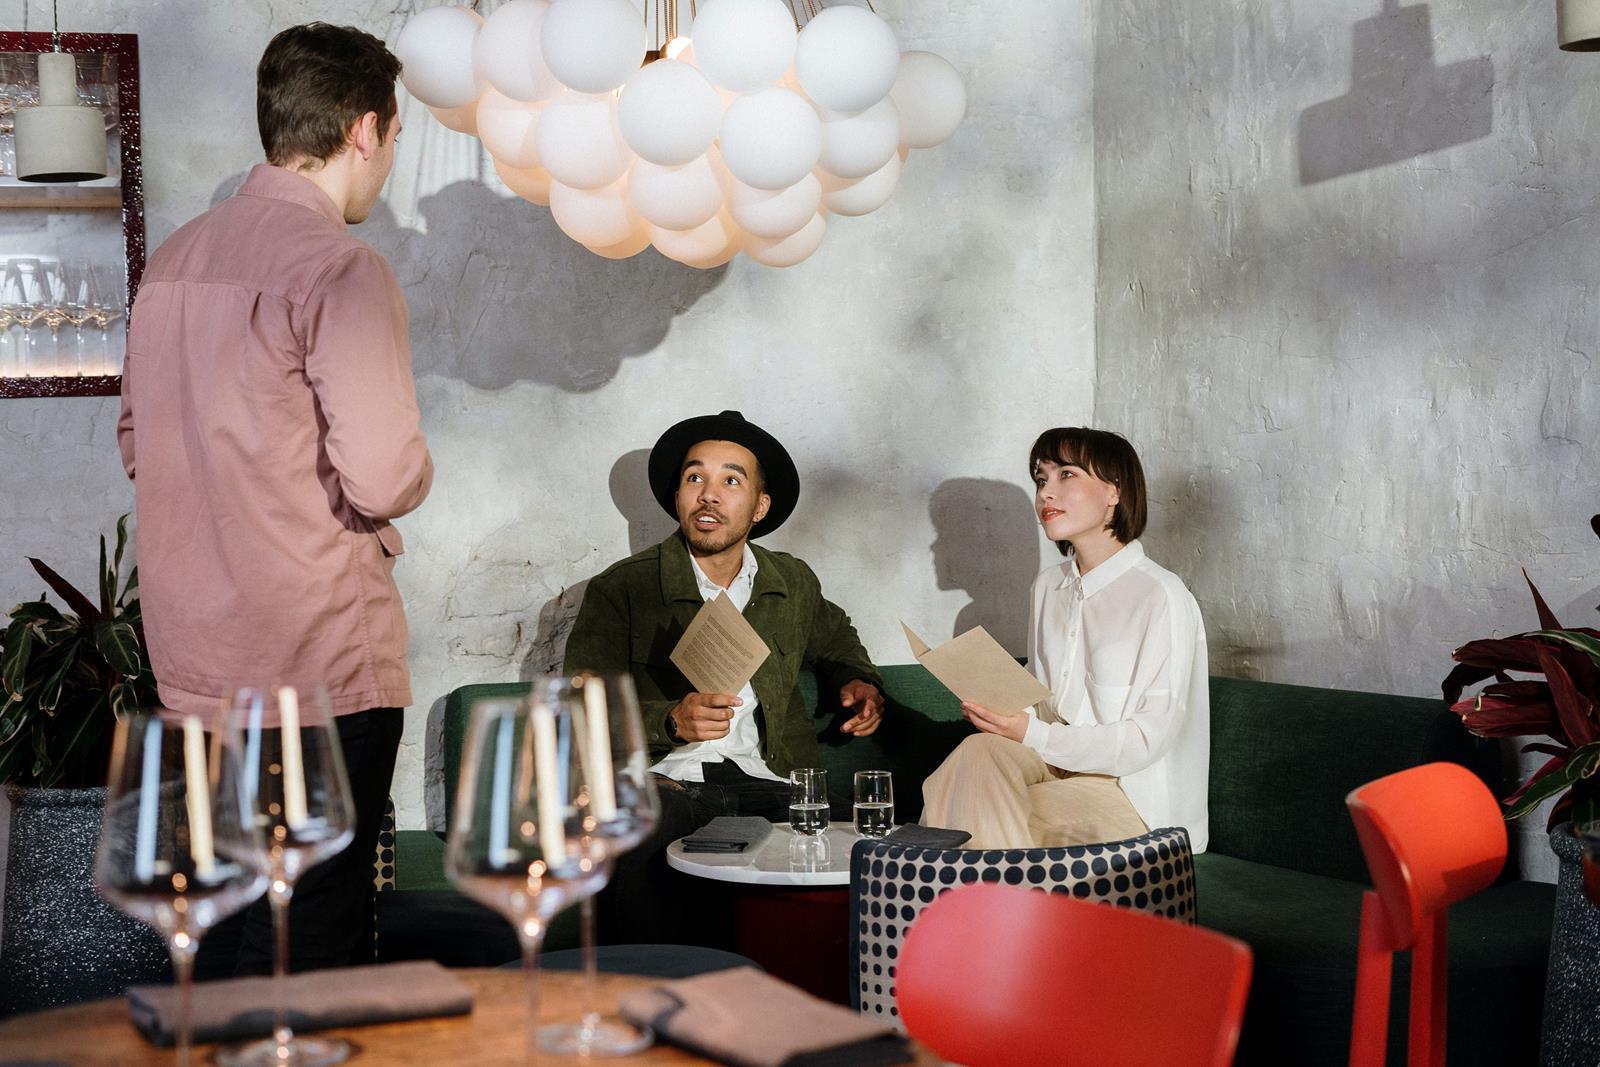 Restaurants – The Different Types of Restaurants